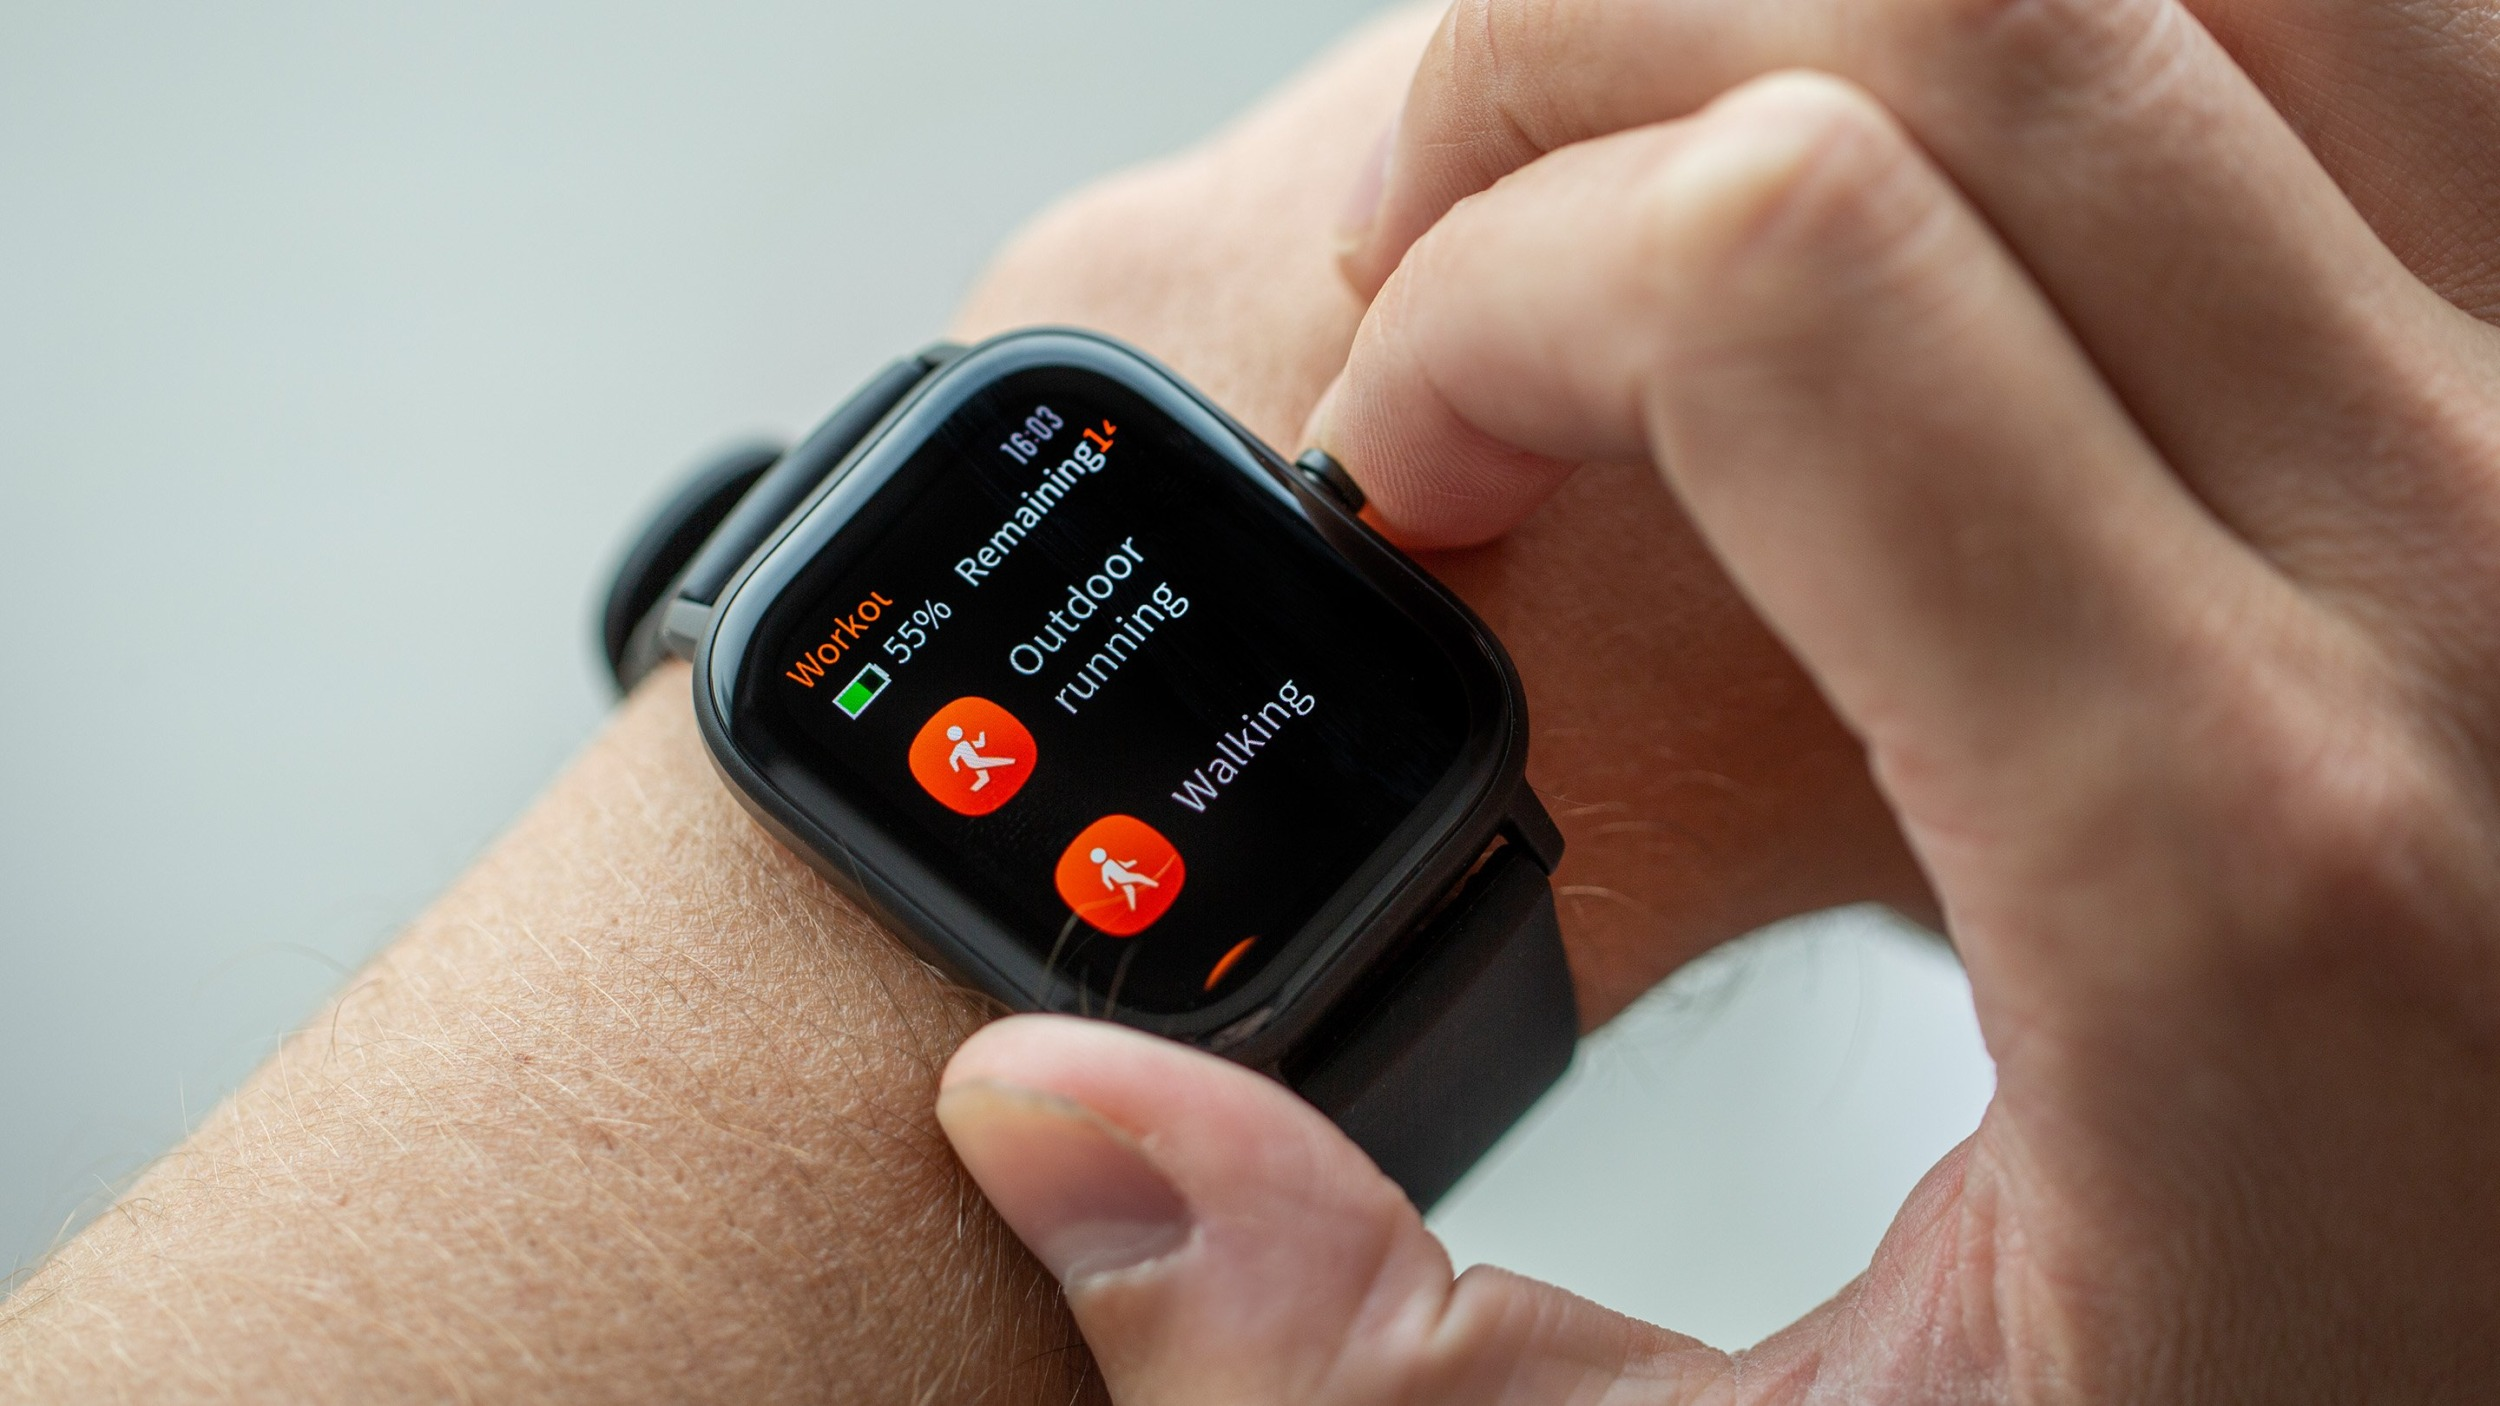 Chytré hodinky a náramky Amazfit od Xiaomi nyní v akci na Gearbestu [sponzorovaný článek]